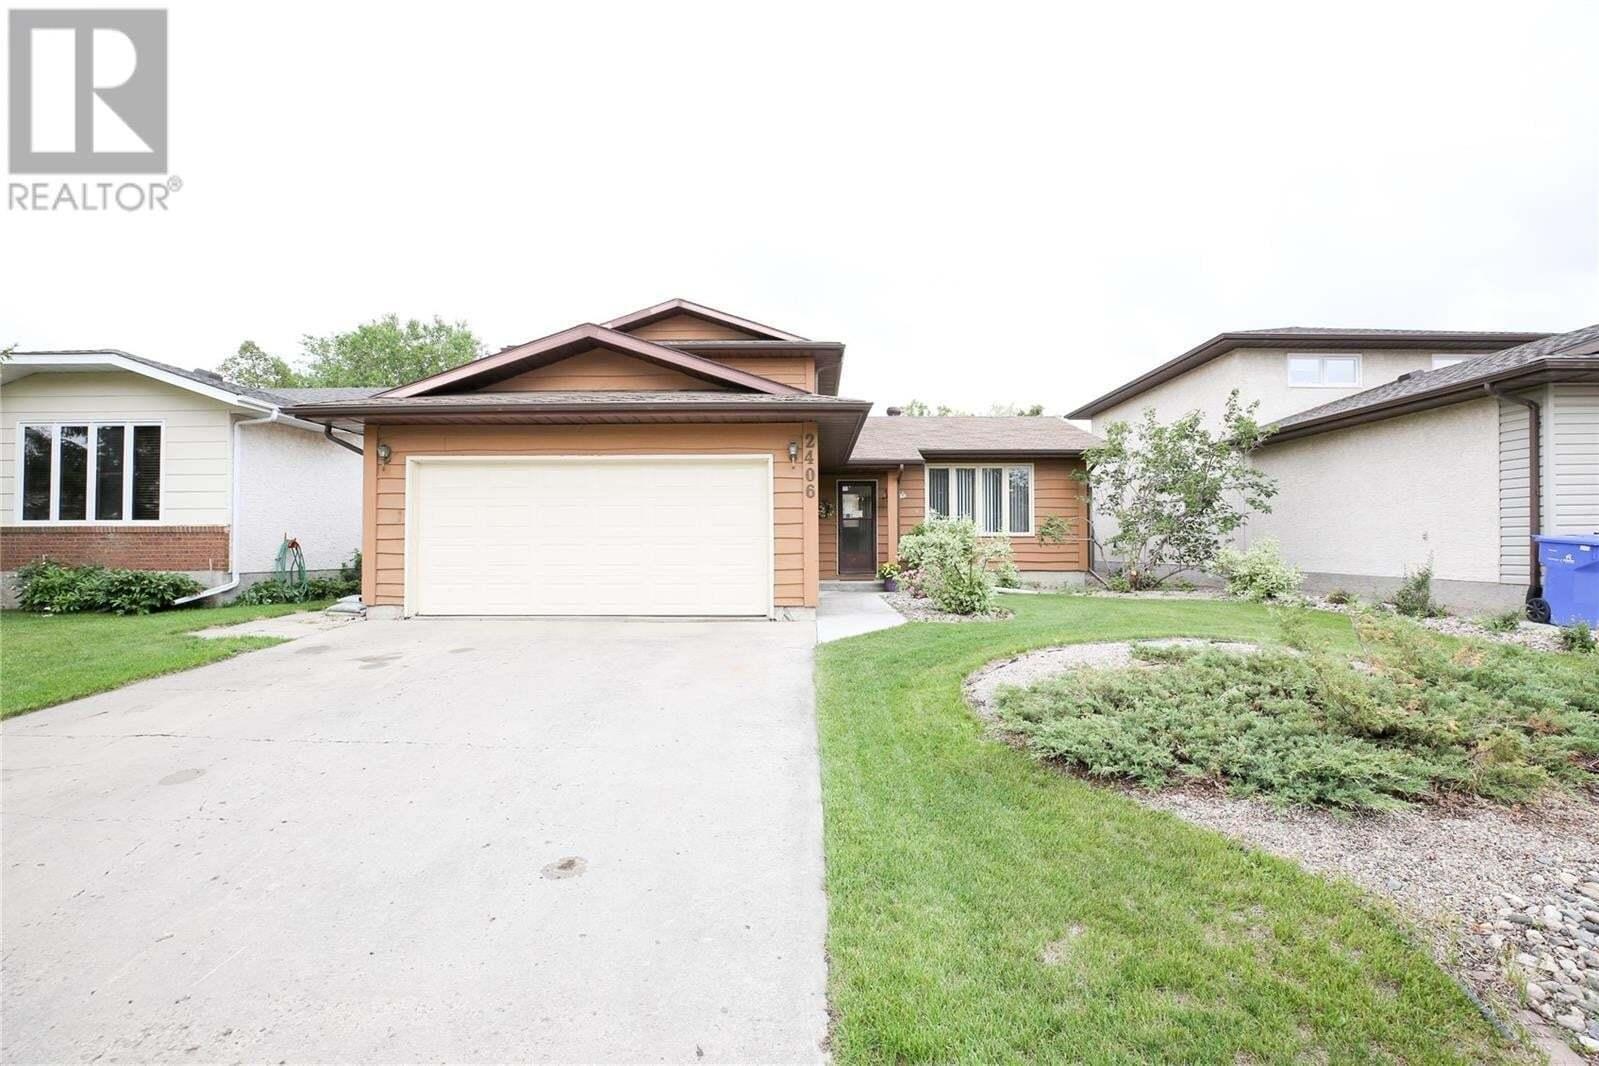 House for sale at 2406 Crowe By E Regina Saskatchewan - MLS: SK815018